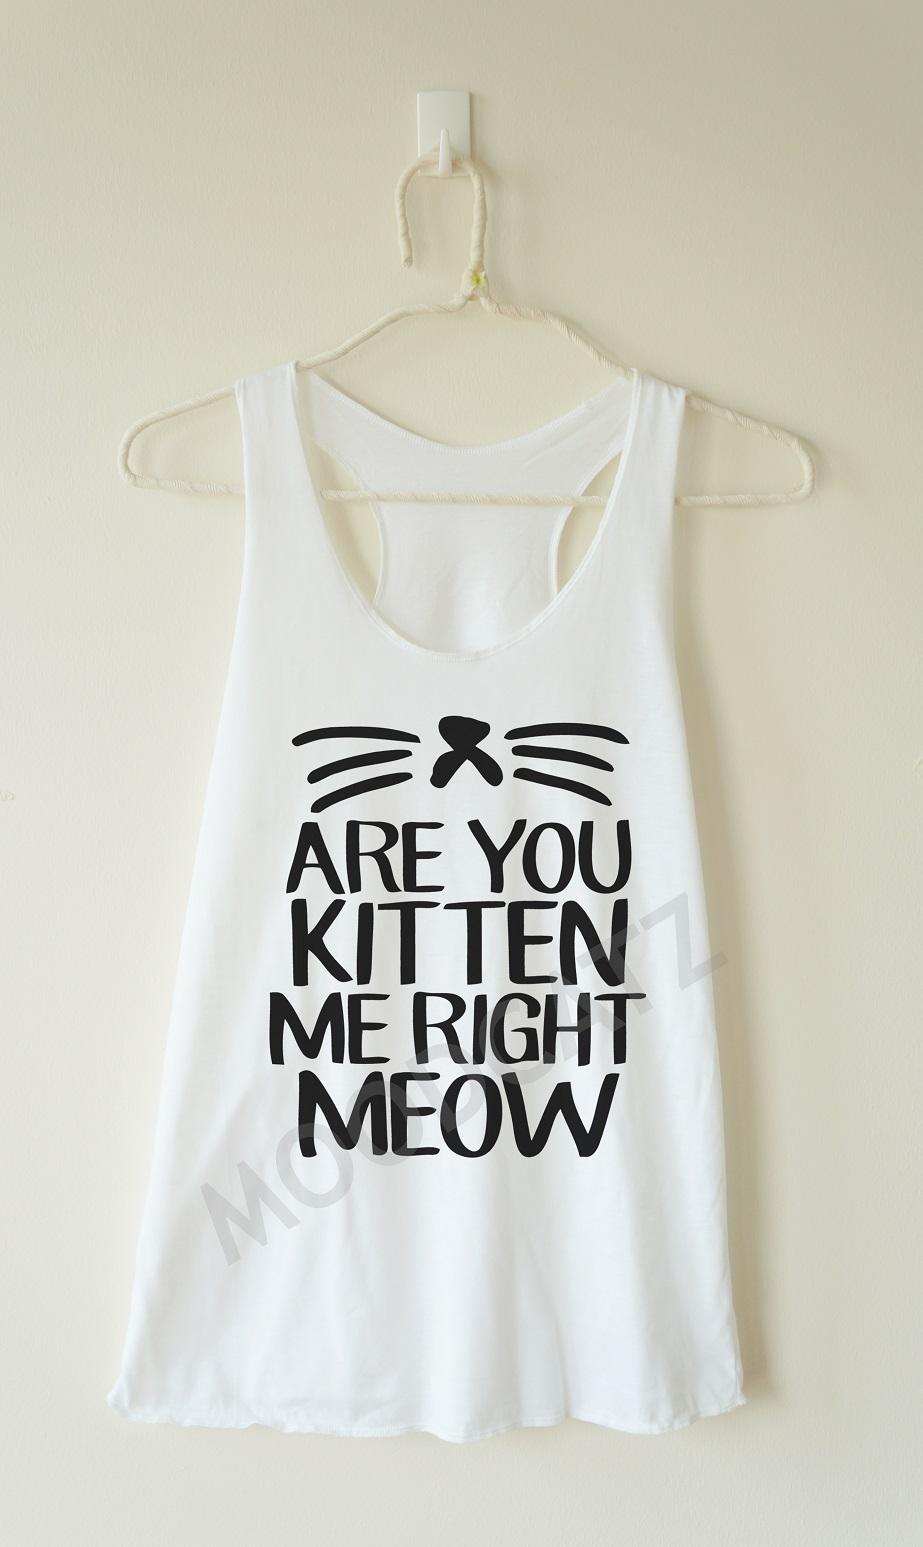 Kitten Right Meow Shirt Cat Shirt Funny Tank Racer Women